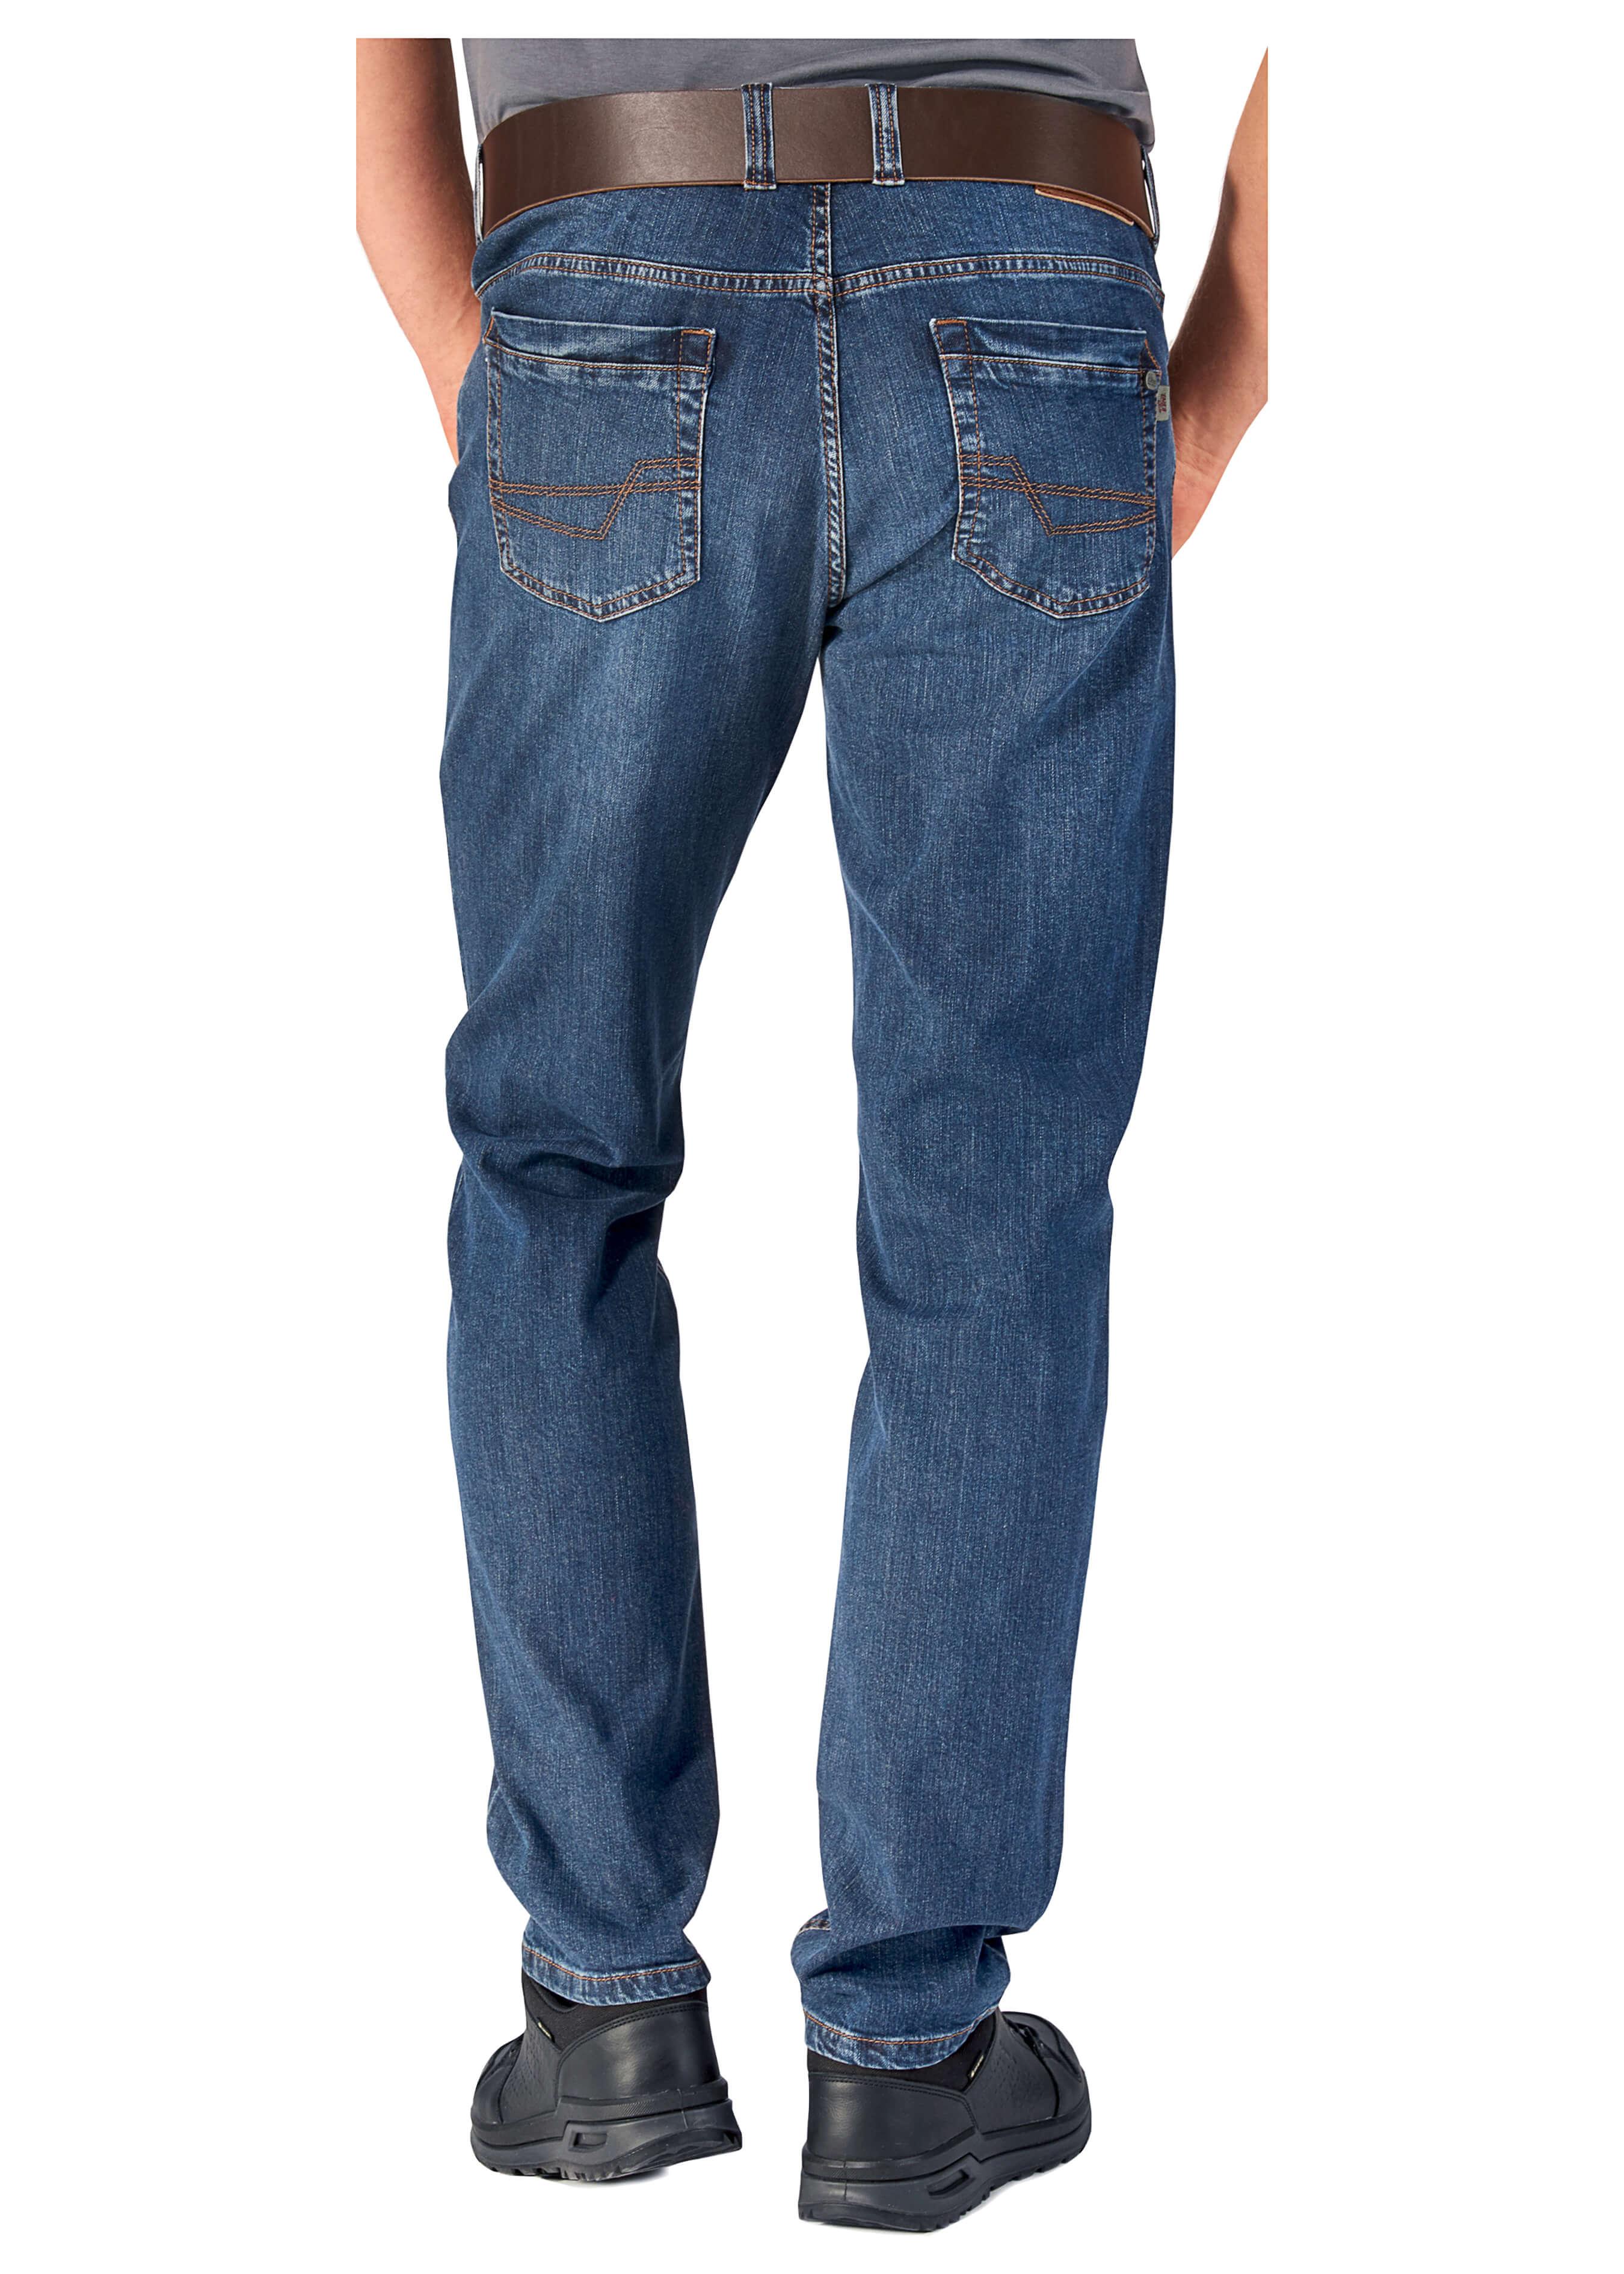 Jean stretch 5 poches Toronto 26753842 2